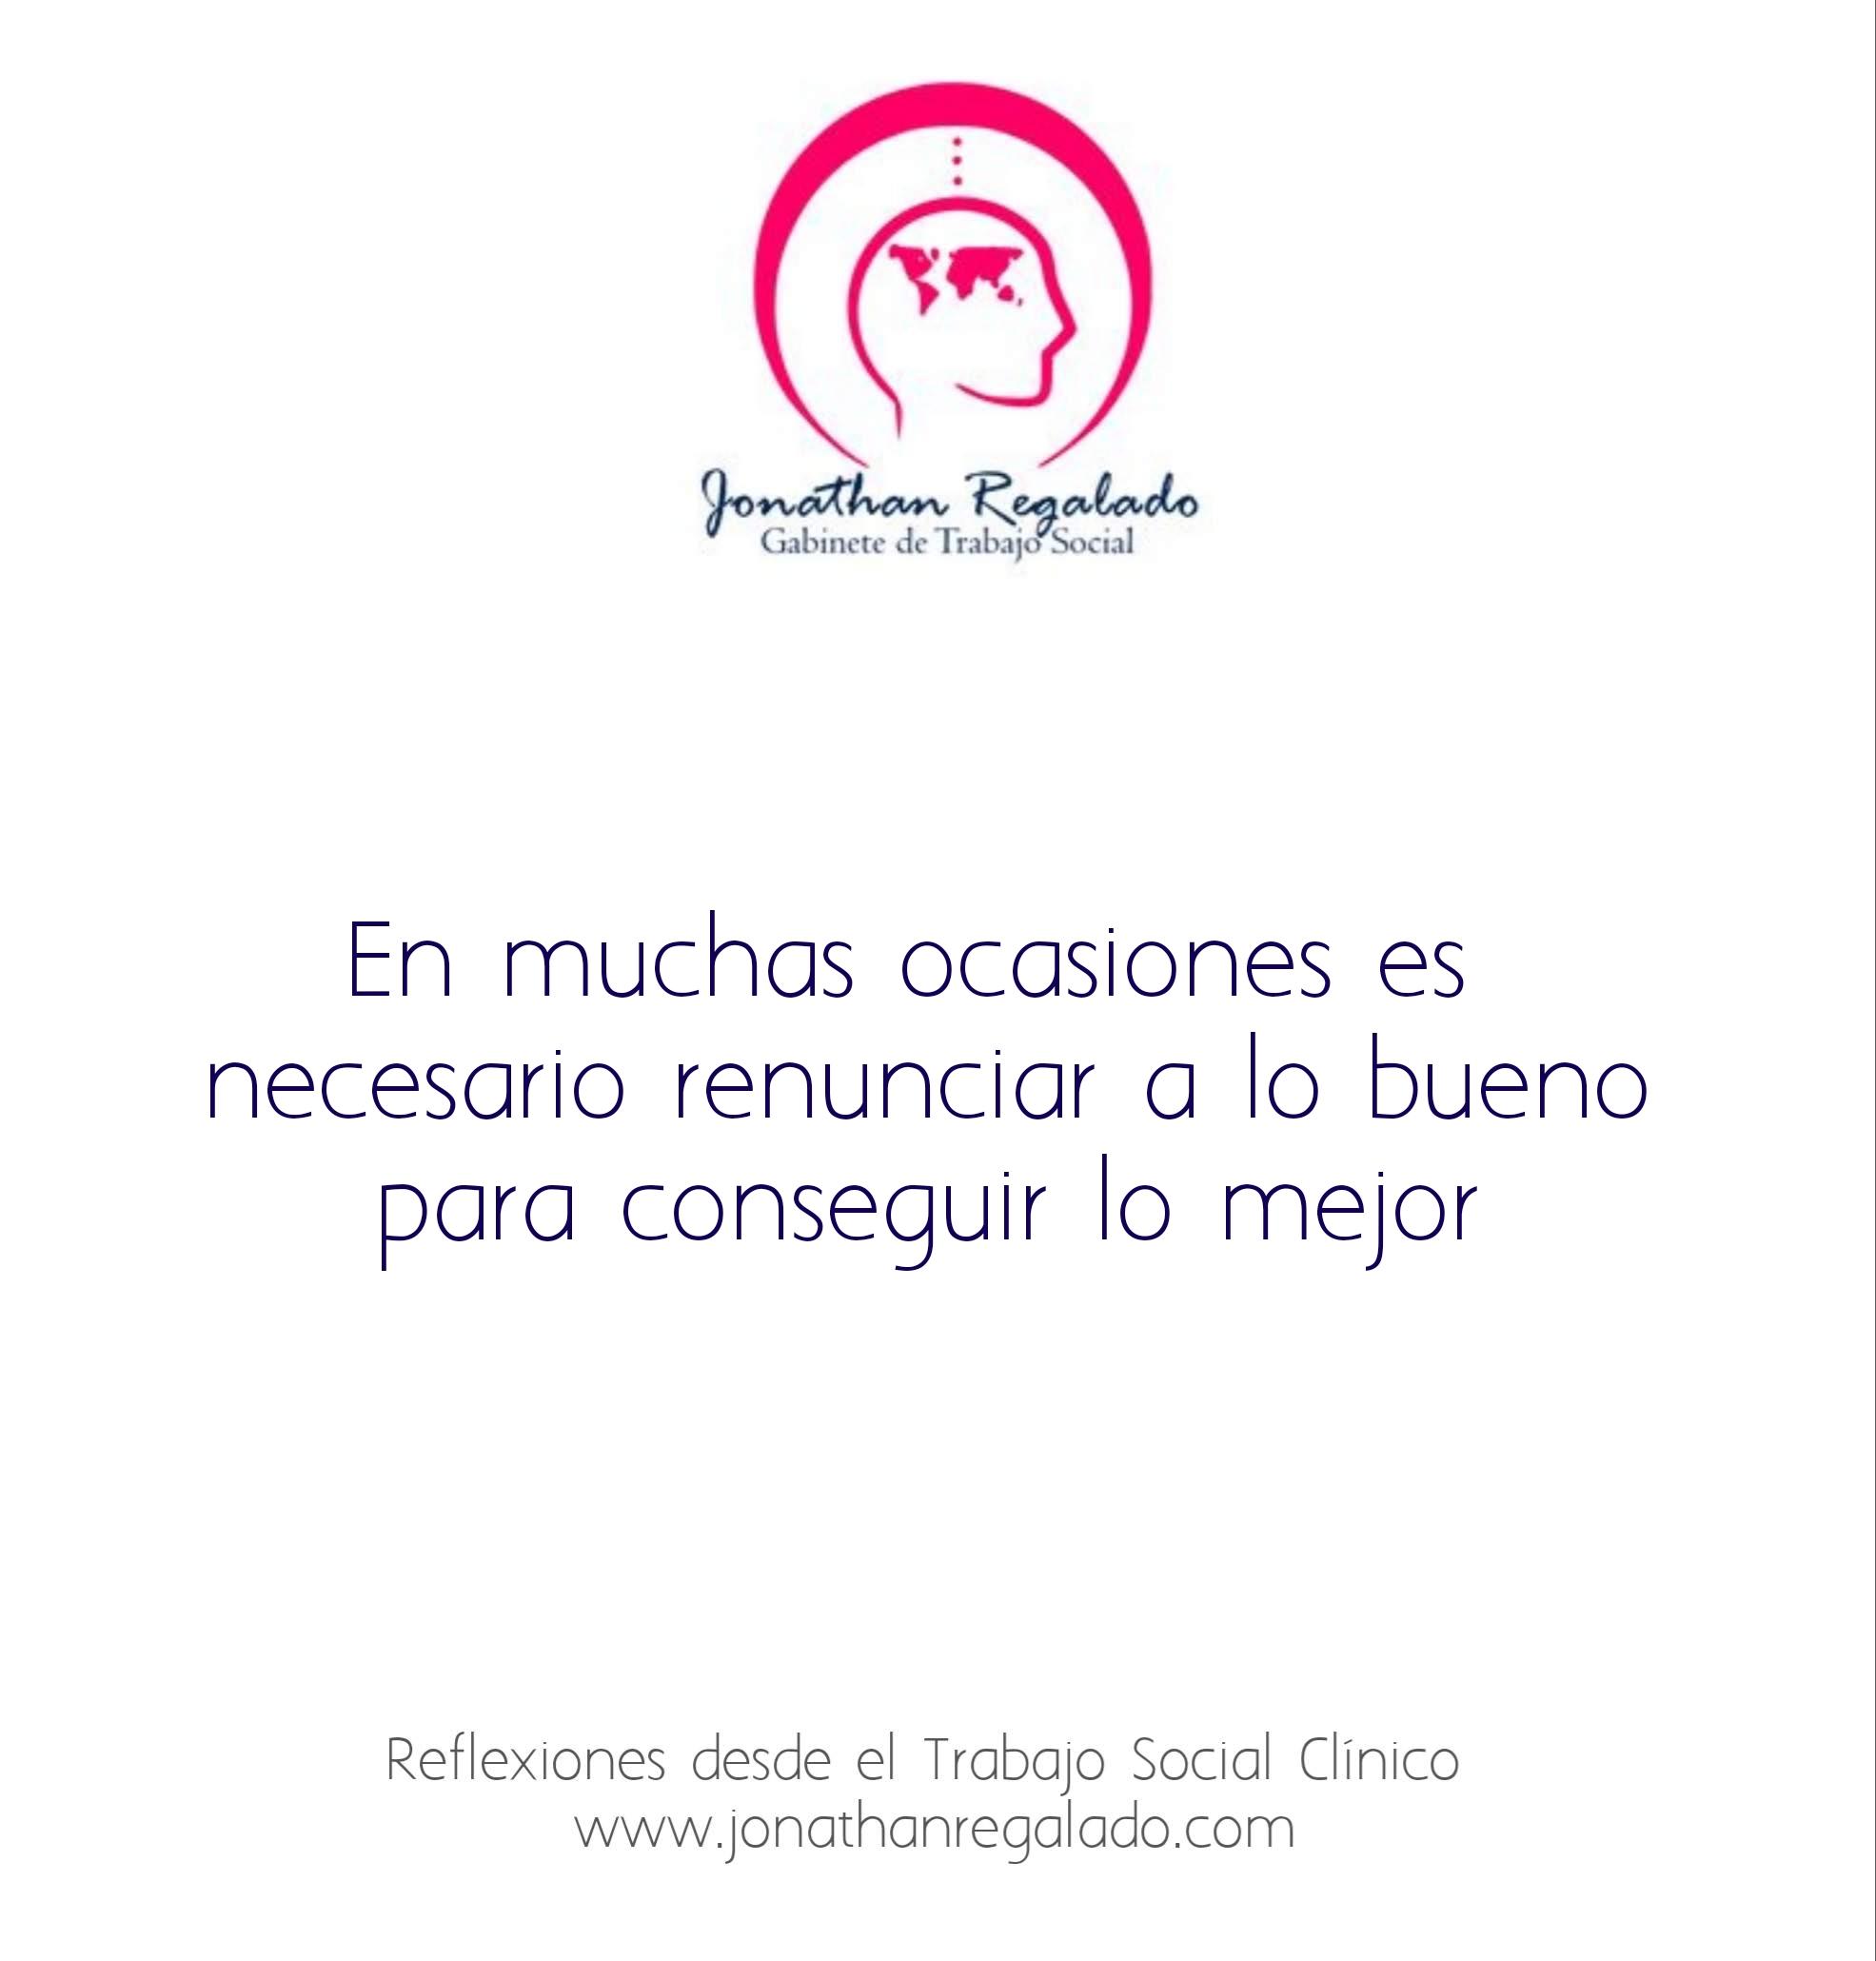 Blanco_20200527070313742